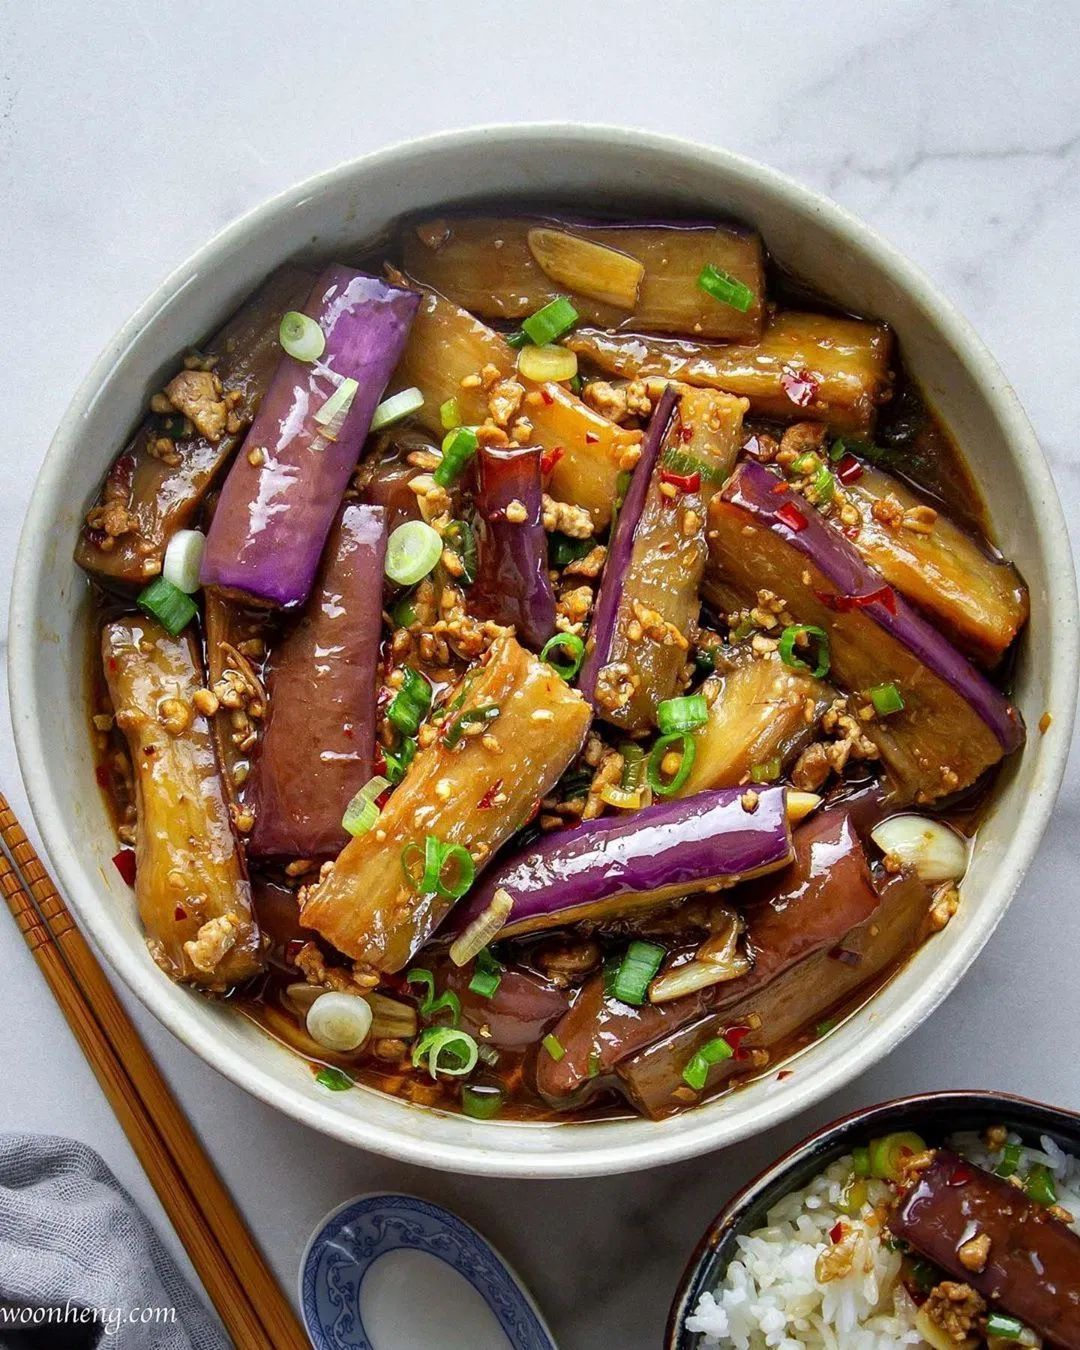 Vegan Spicy Garlic Eggplant Recipe In 2021 Delicious Vegan Recipes Spicy Eggplant Eggplant Dishes